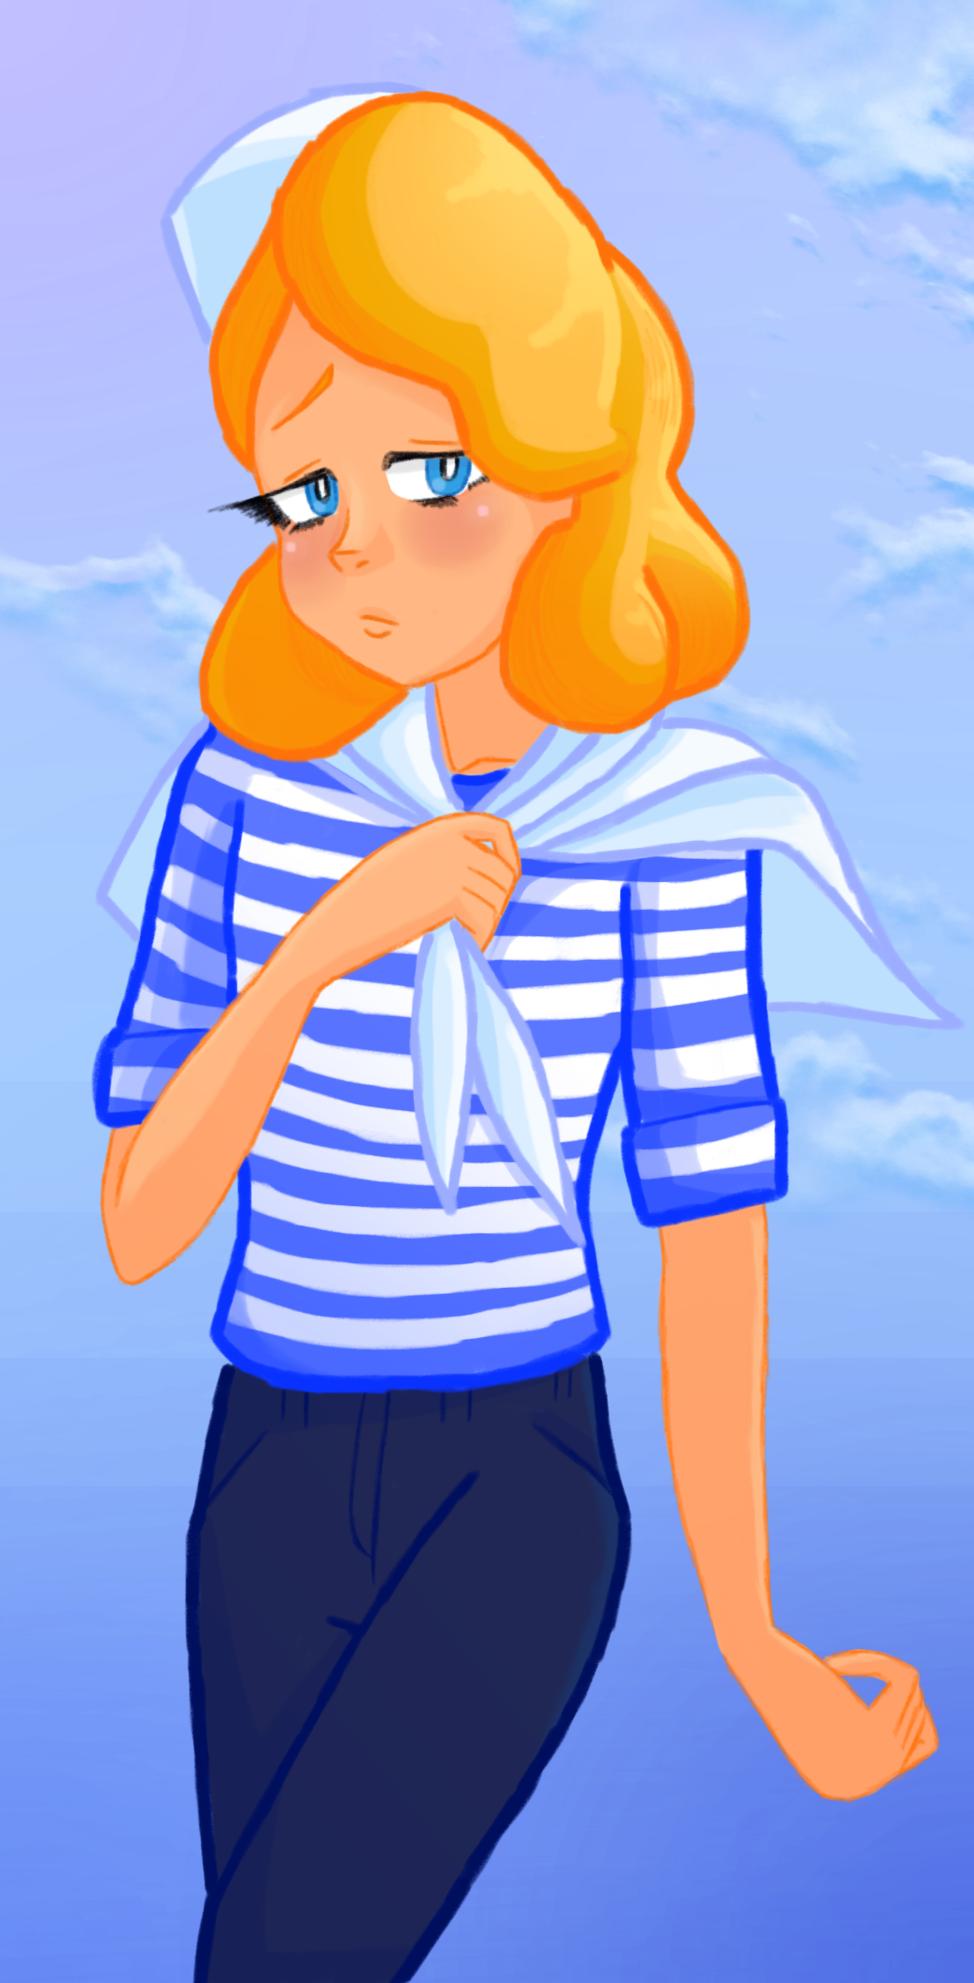 Most recent image: Sailor Horatio